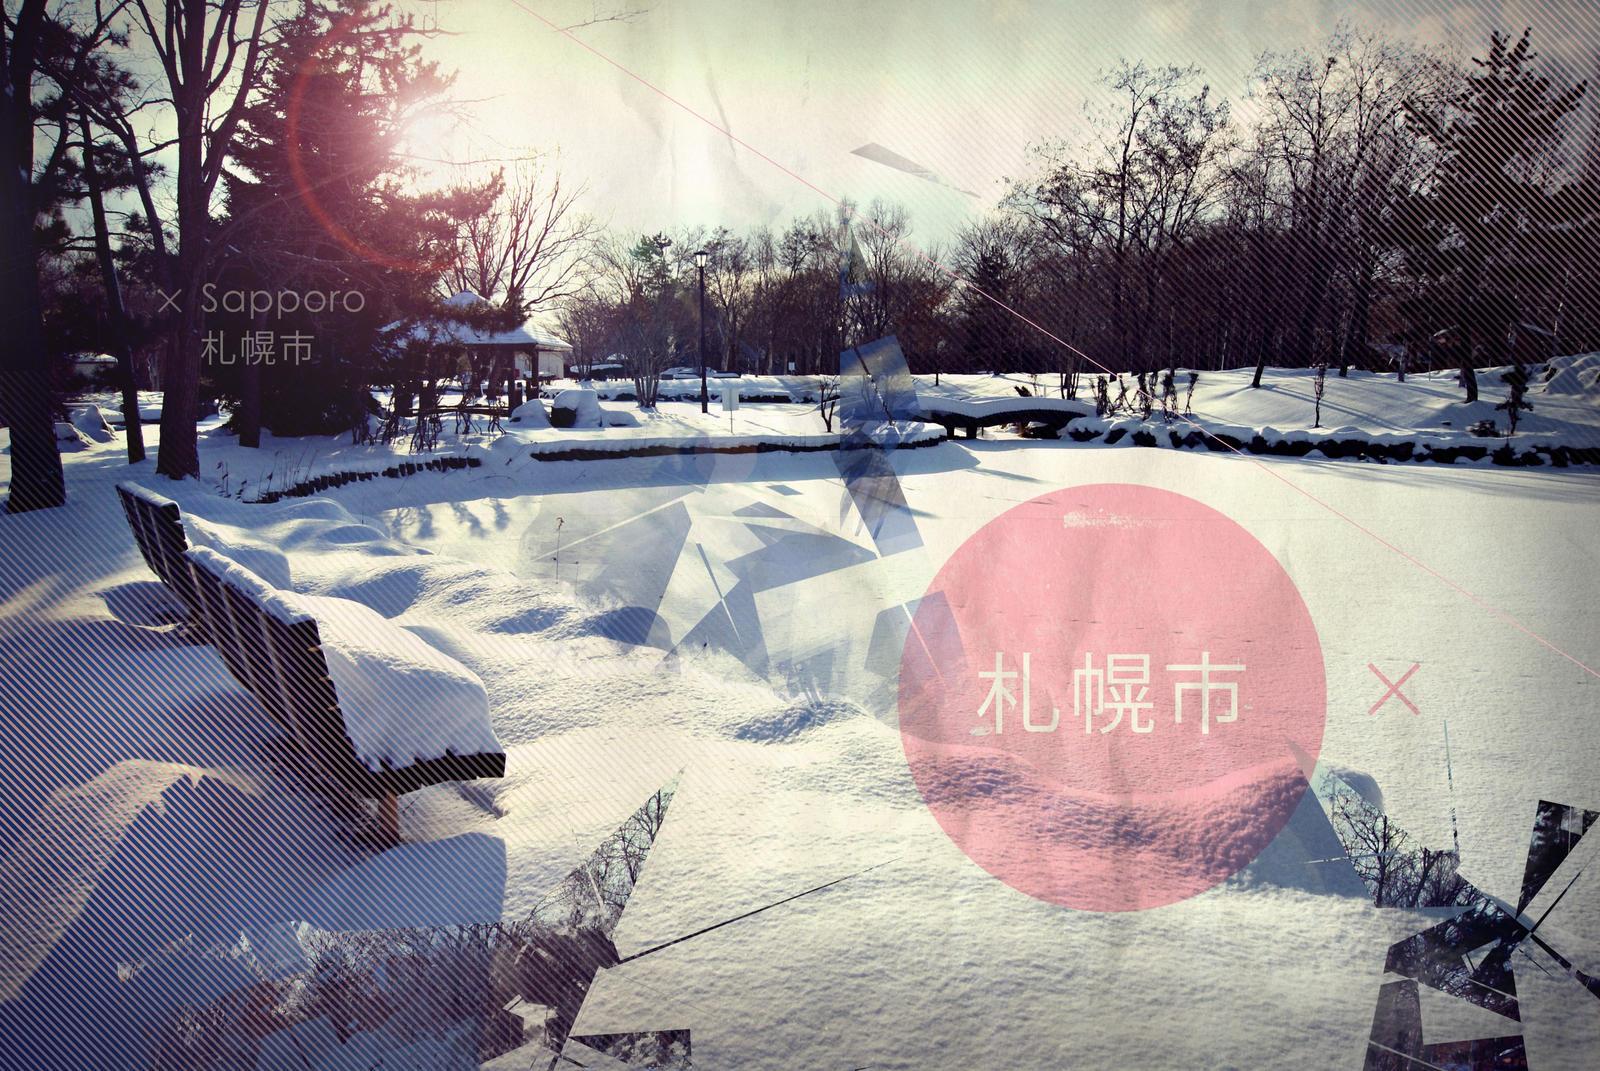 Sapporo by NoamM